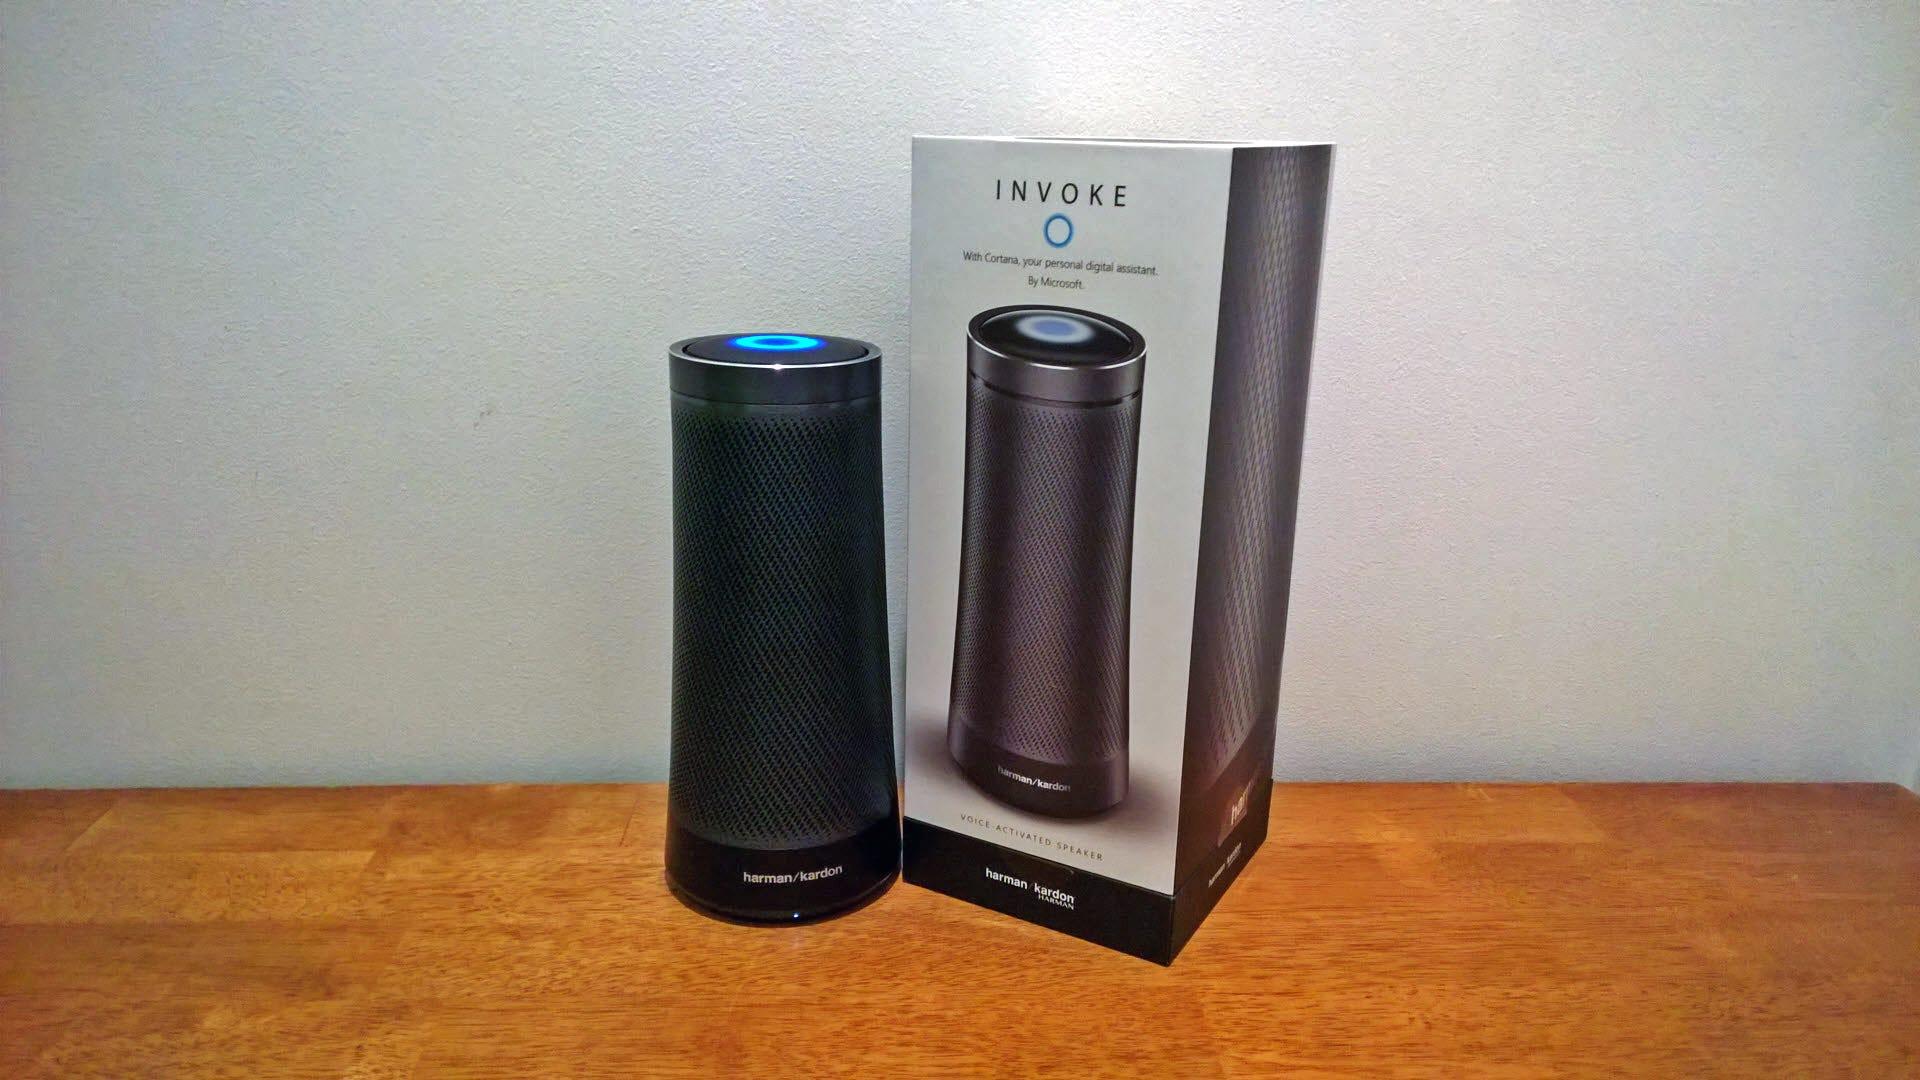 A Harmon-Kardon Invoke speaker next to its box.